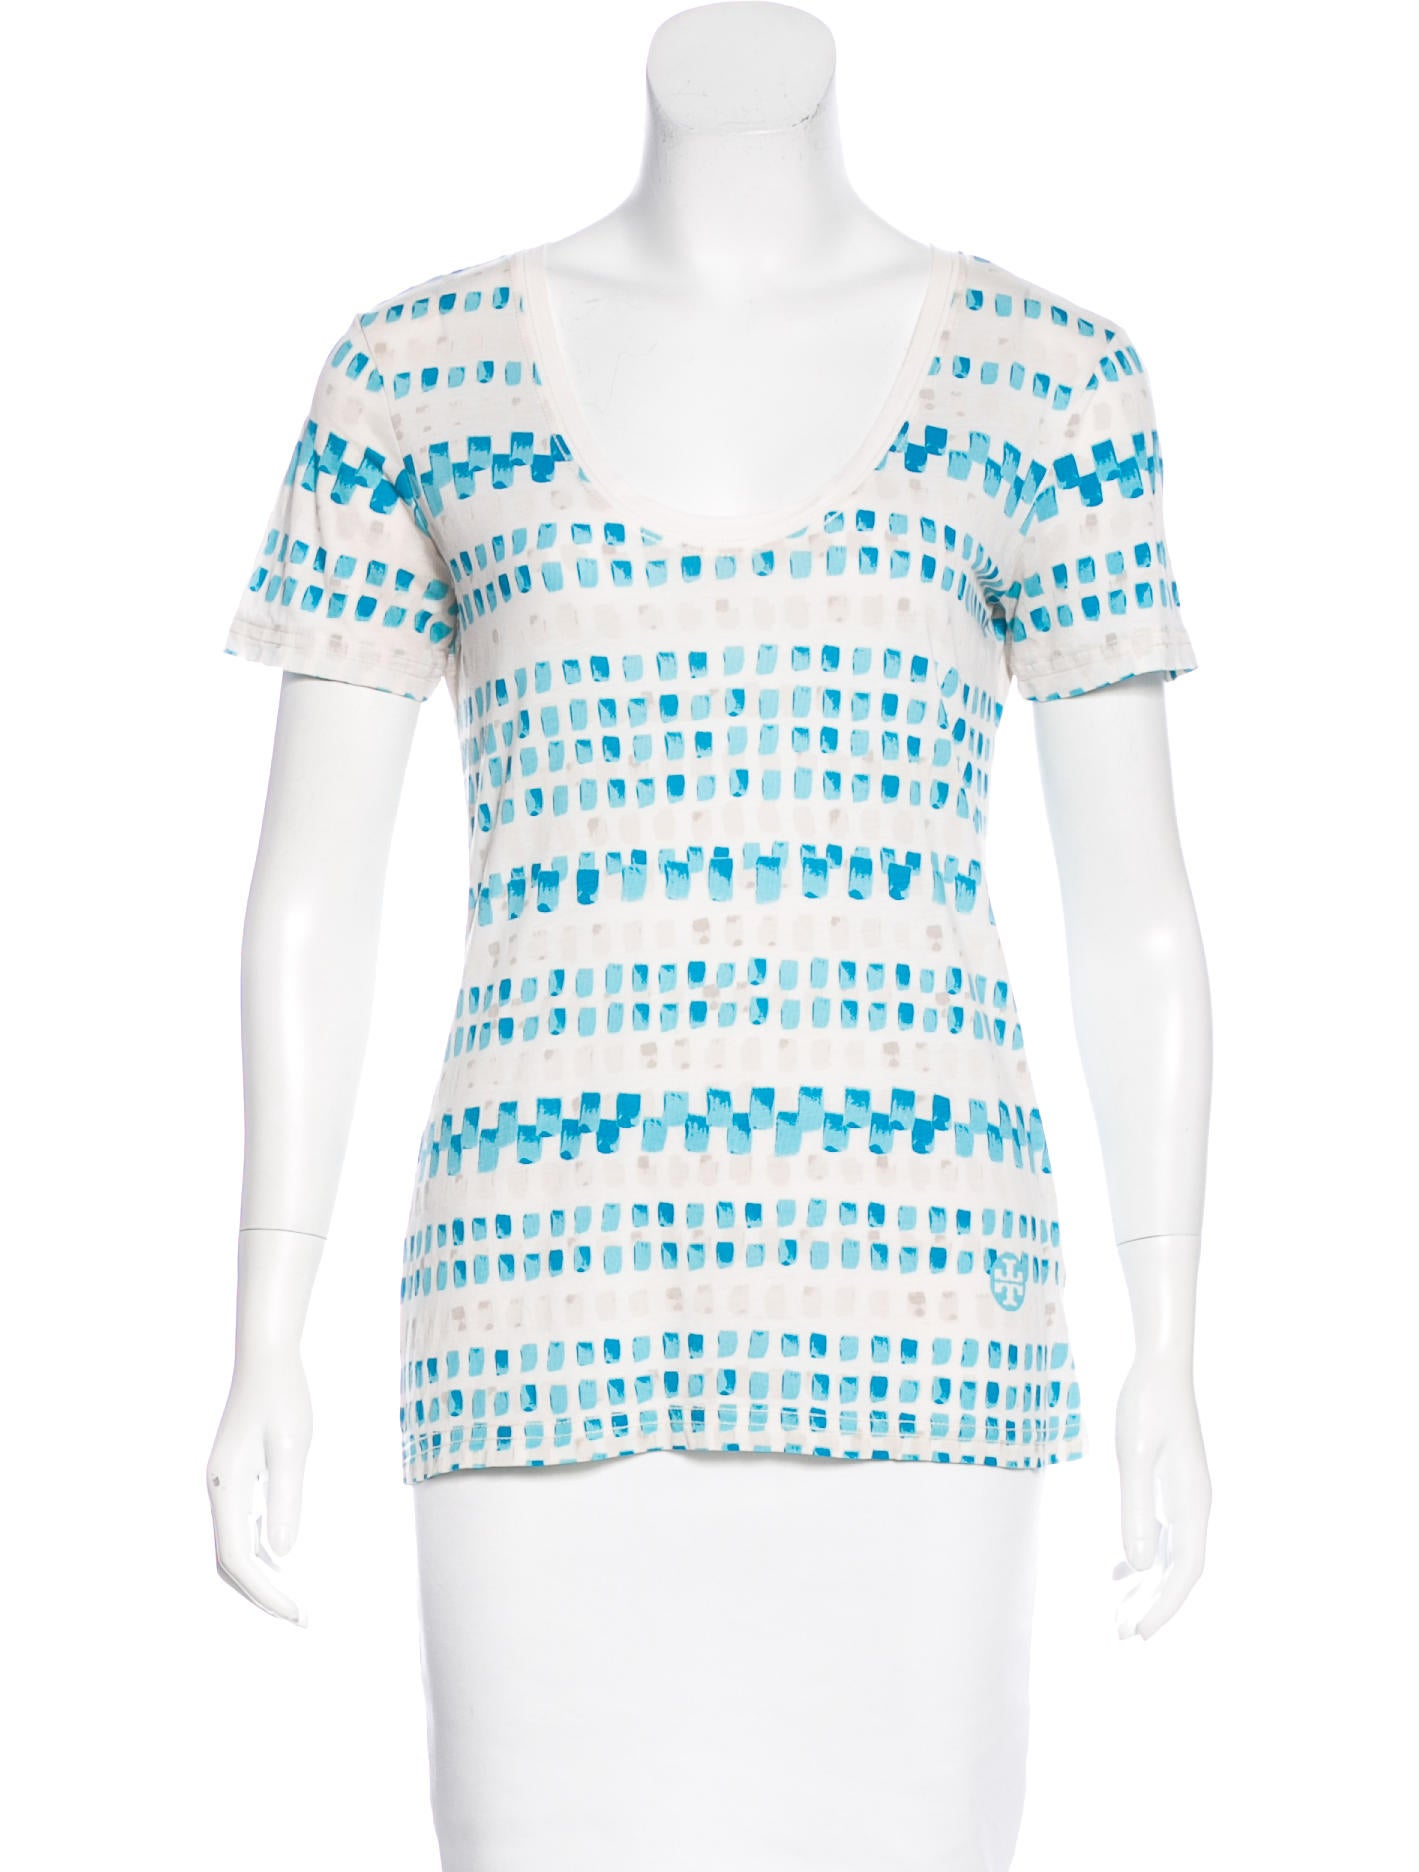 Tory burch printed scoop neck t shirt clothing for Tory burch t shirt